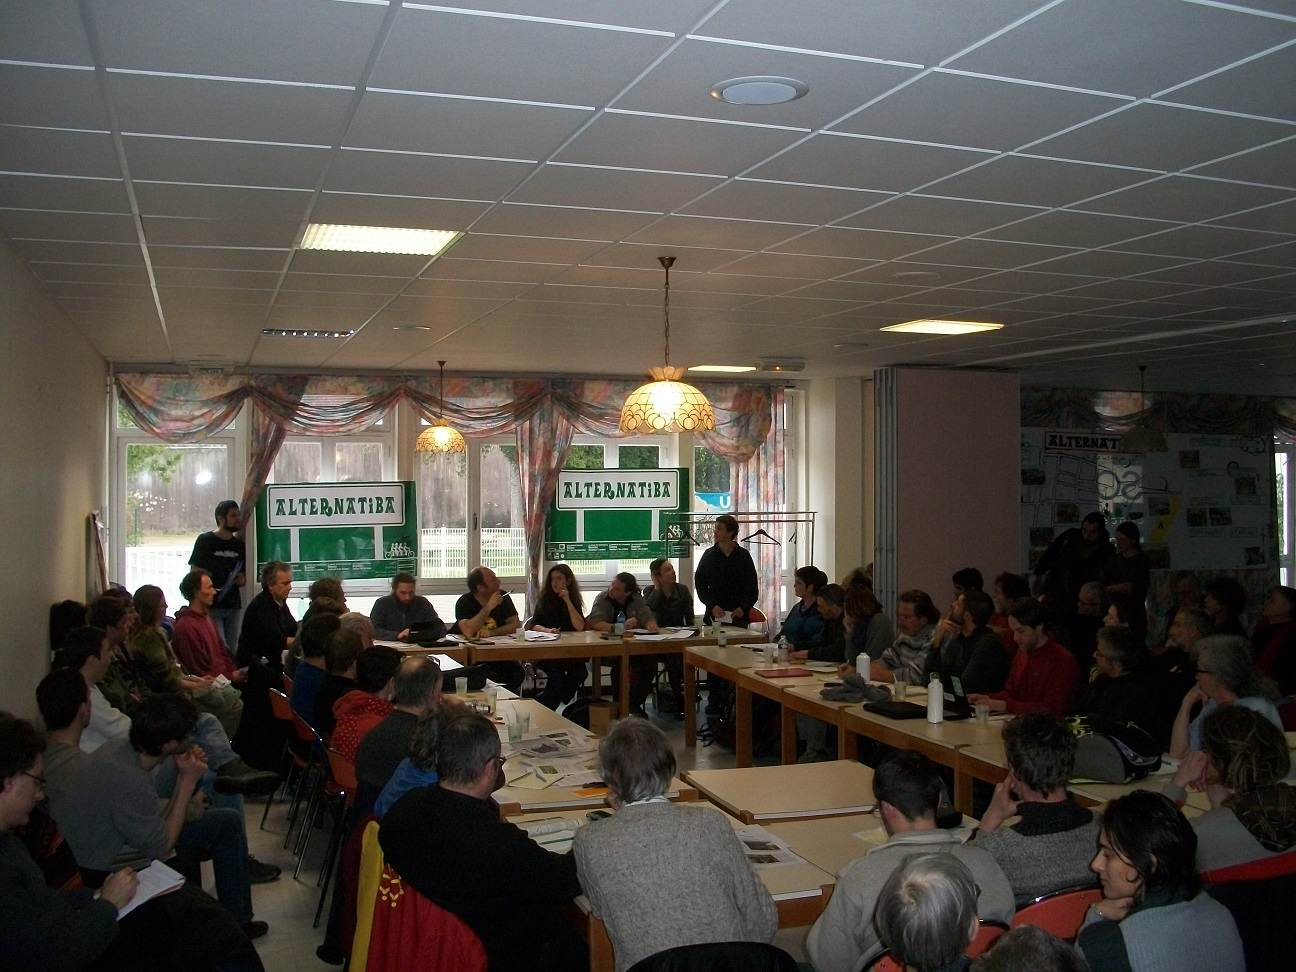 Coordination des Alternatiba à Nantes